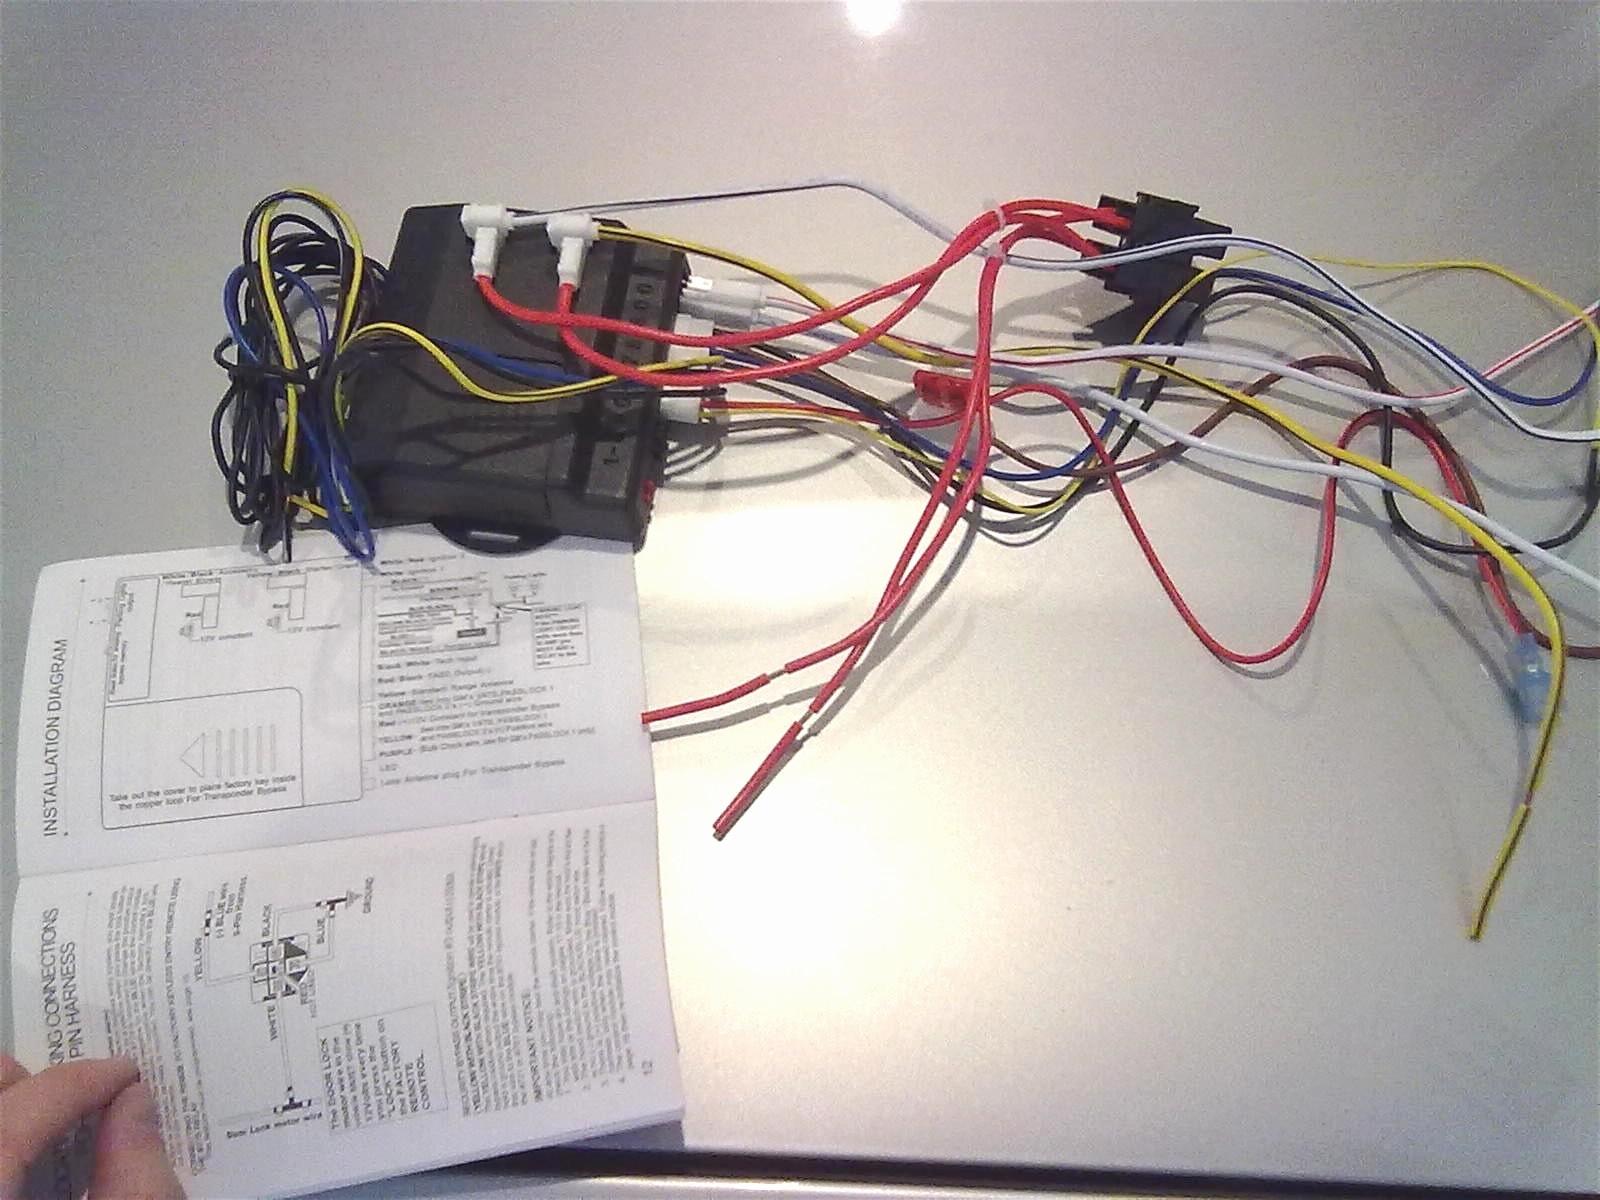 bulldog security remote starter wiring diagram - zookastar - bulldog remote  start wiring diagram